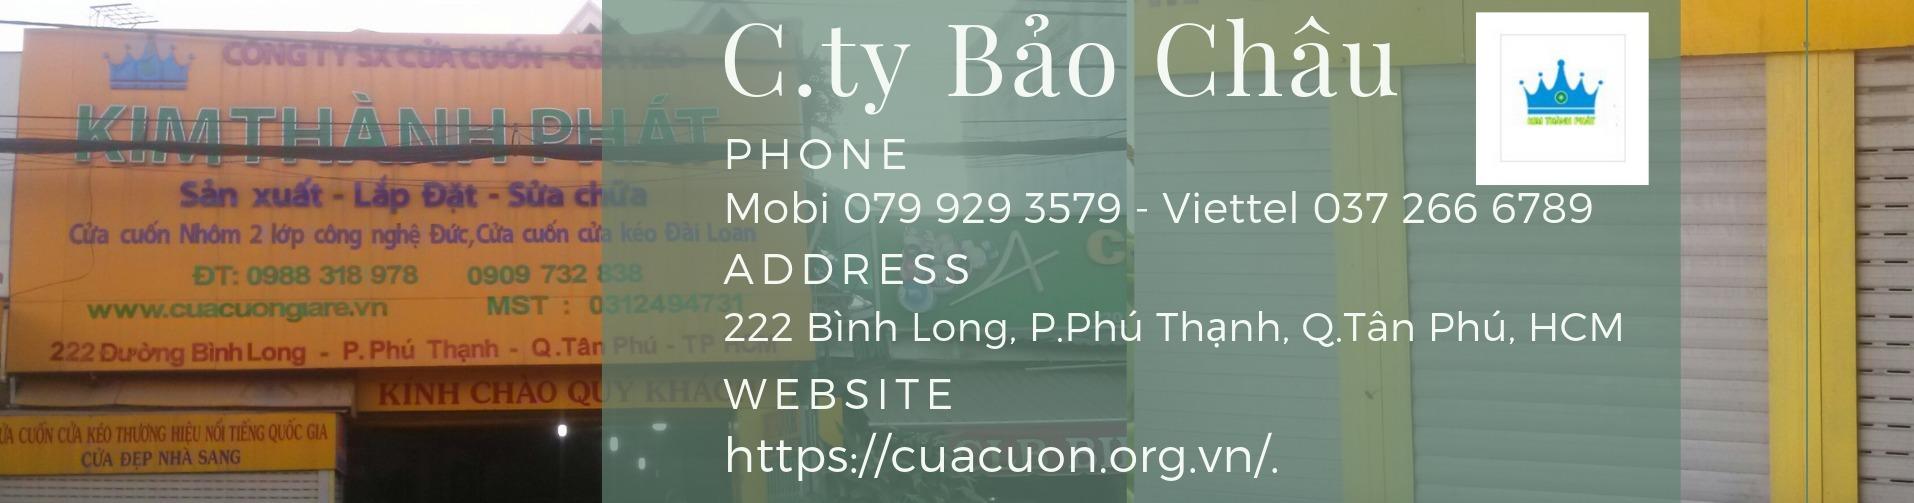 Cong Ty Cua Cuon TNHH TM-SX-DV Bao Chau (@cuacuonbaochau) Cover Image